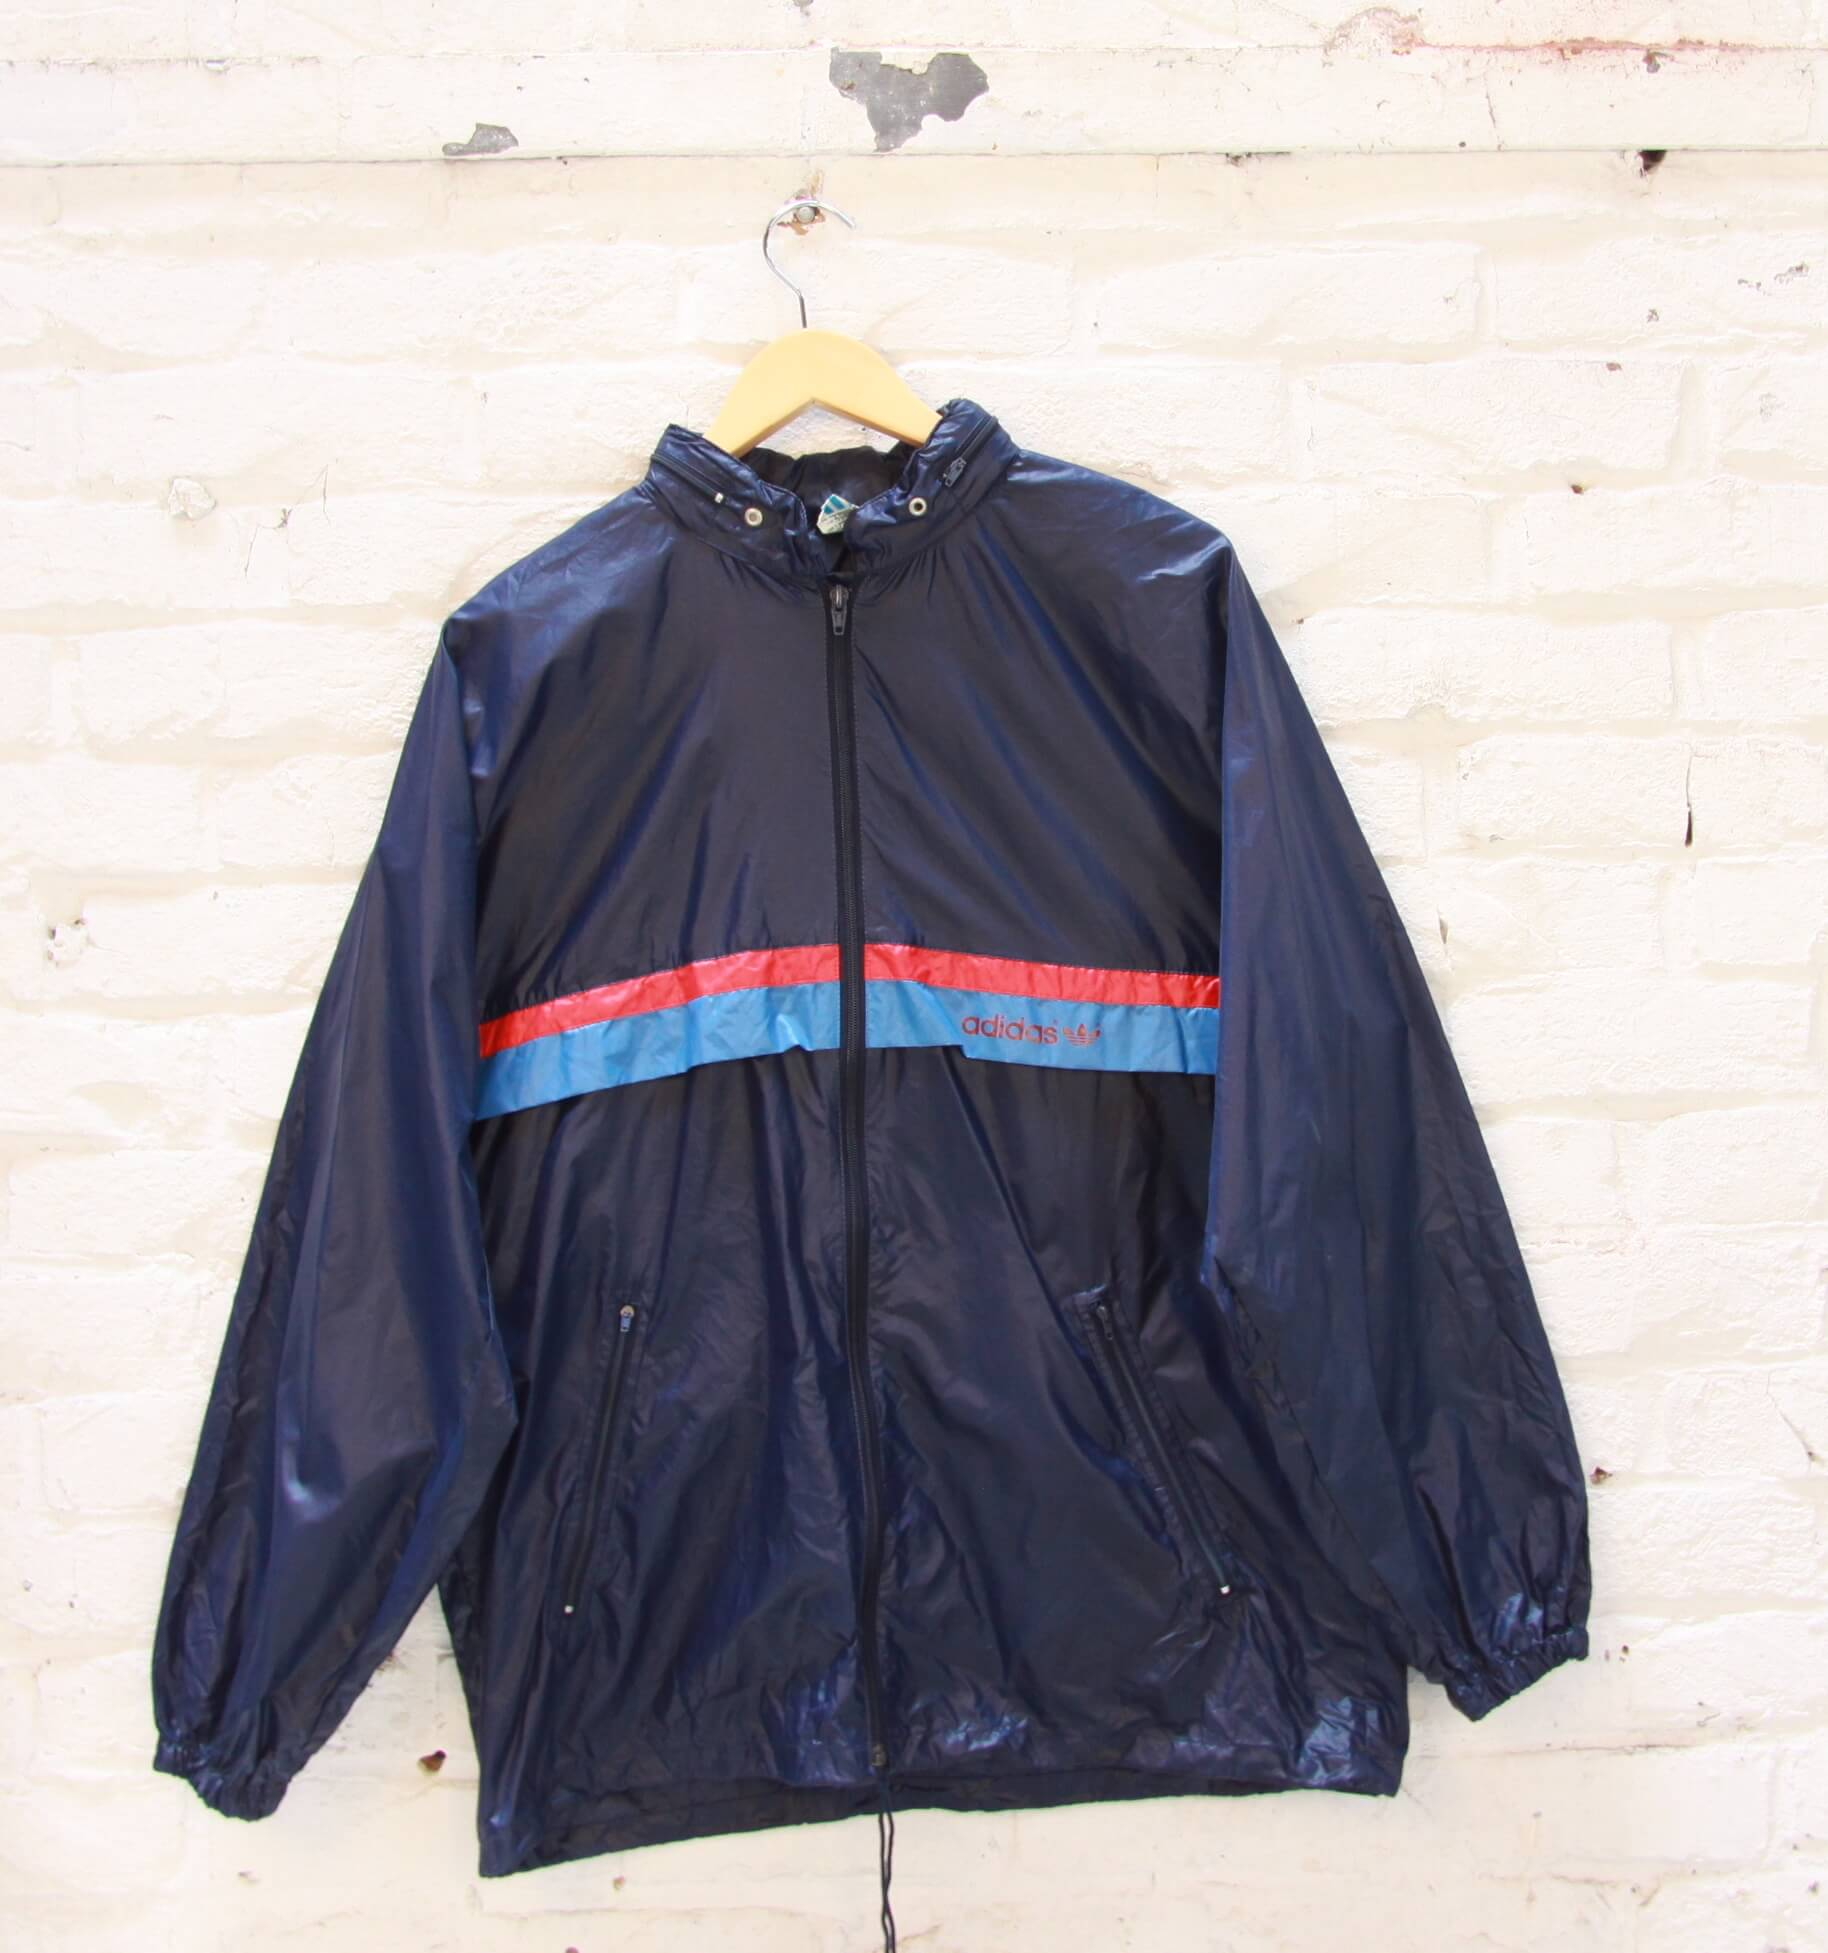 Veste Vintage Coupe Vent Adidas Bleu Tilt Vintage